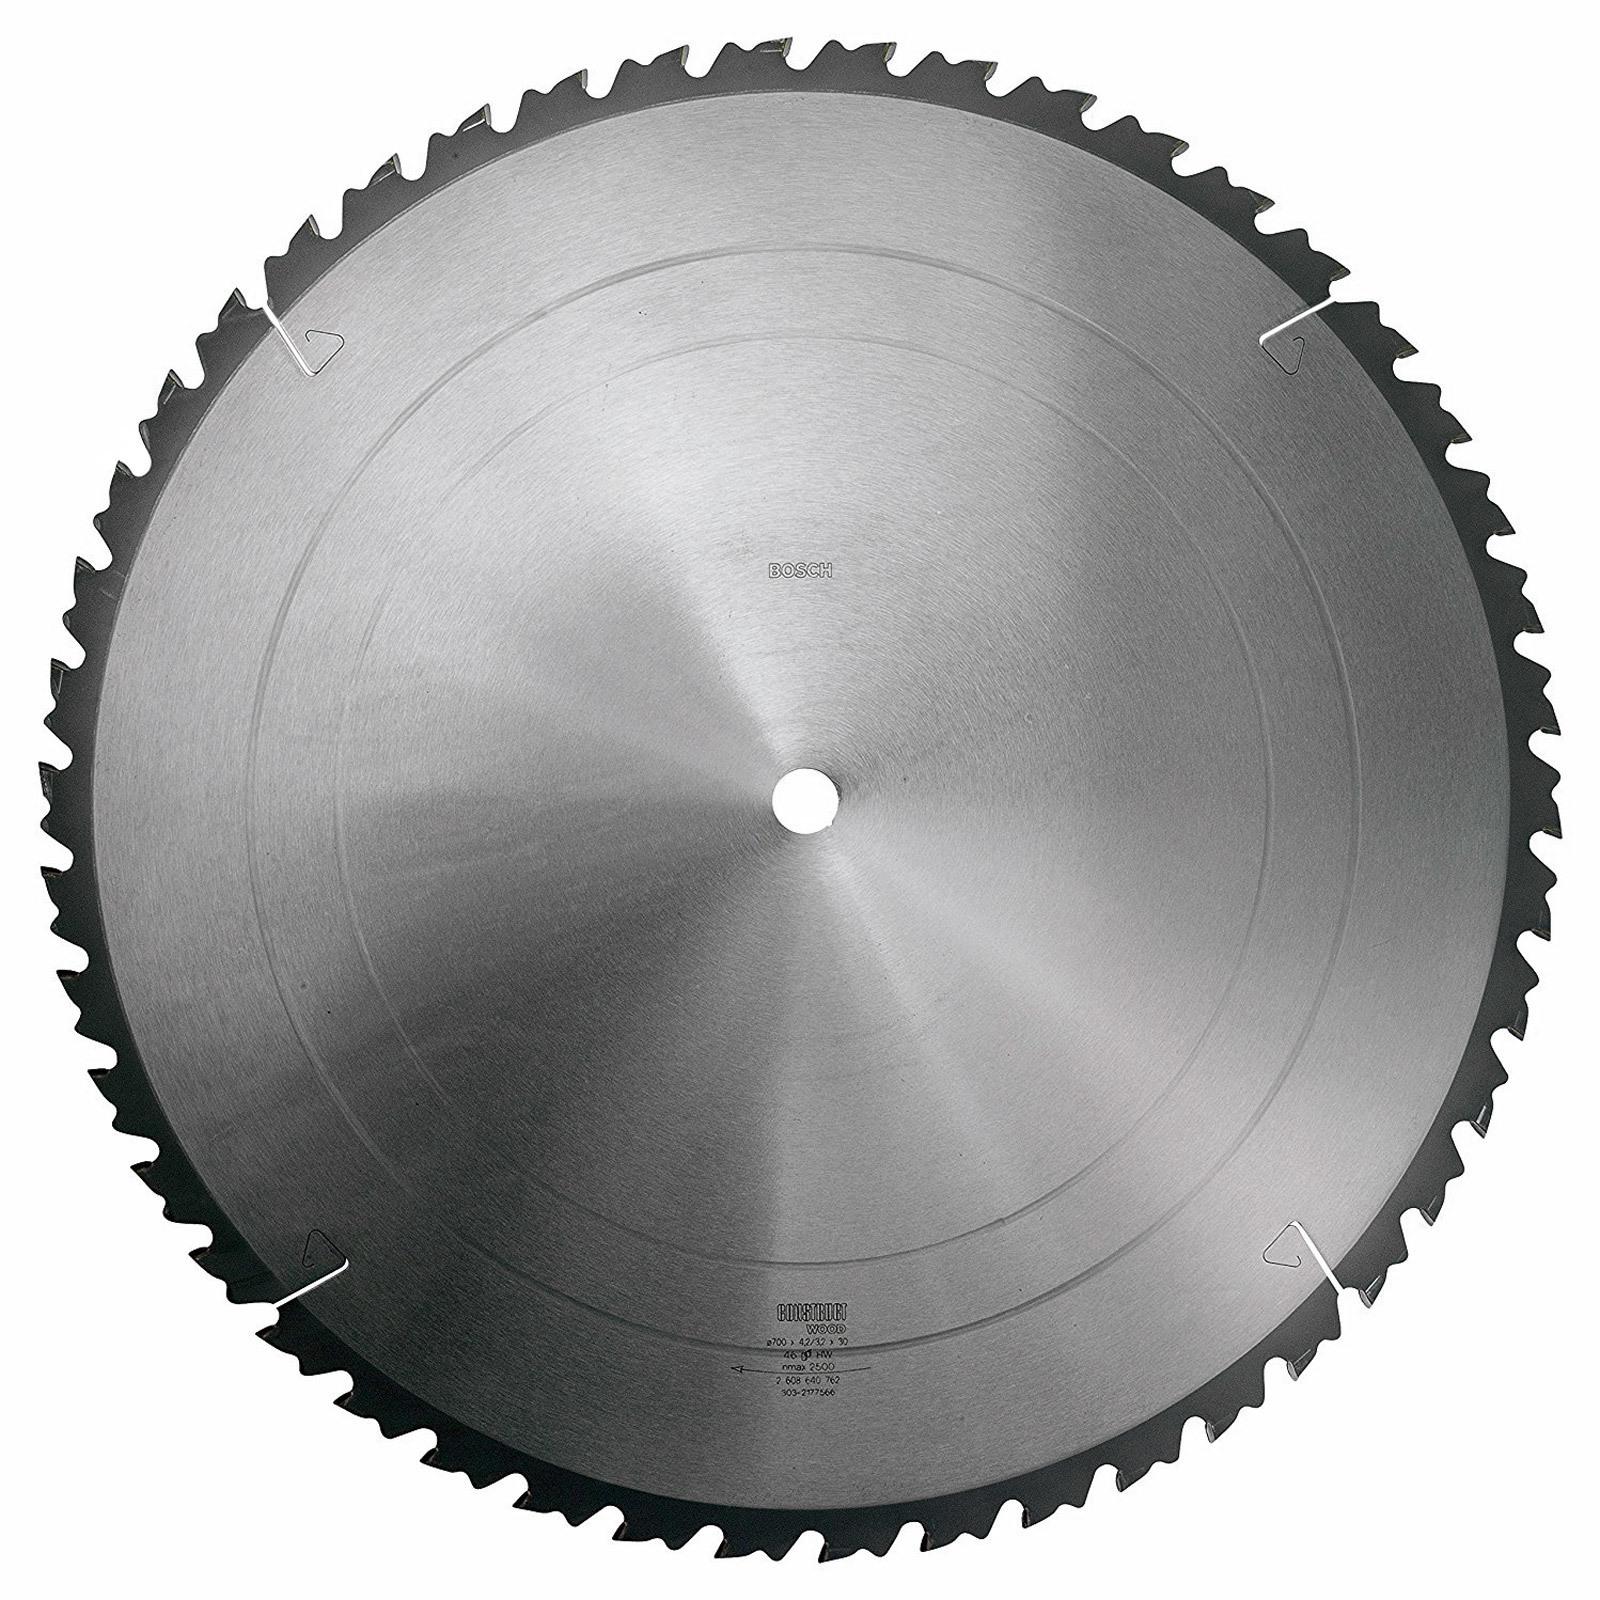 18 Zähne HM-Sägeblatt//Kreissägeblatt für Kreissäge Ø 190 x 32//30 mm NEU